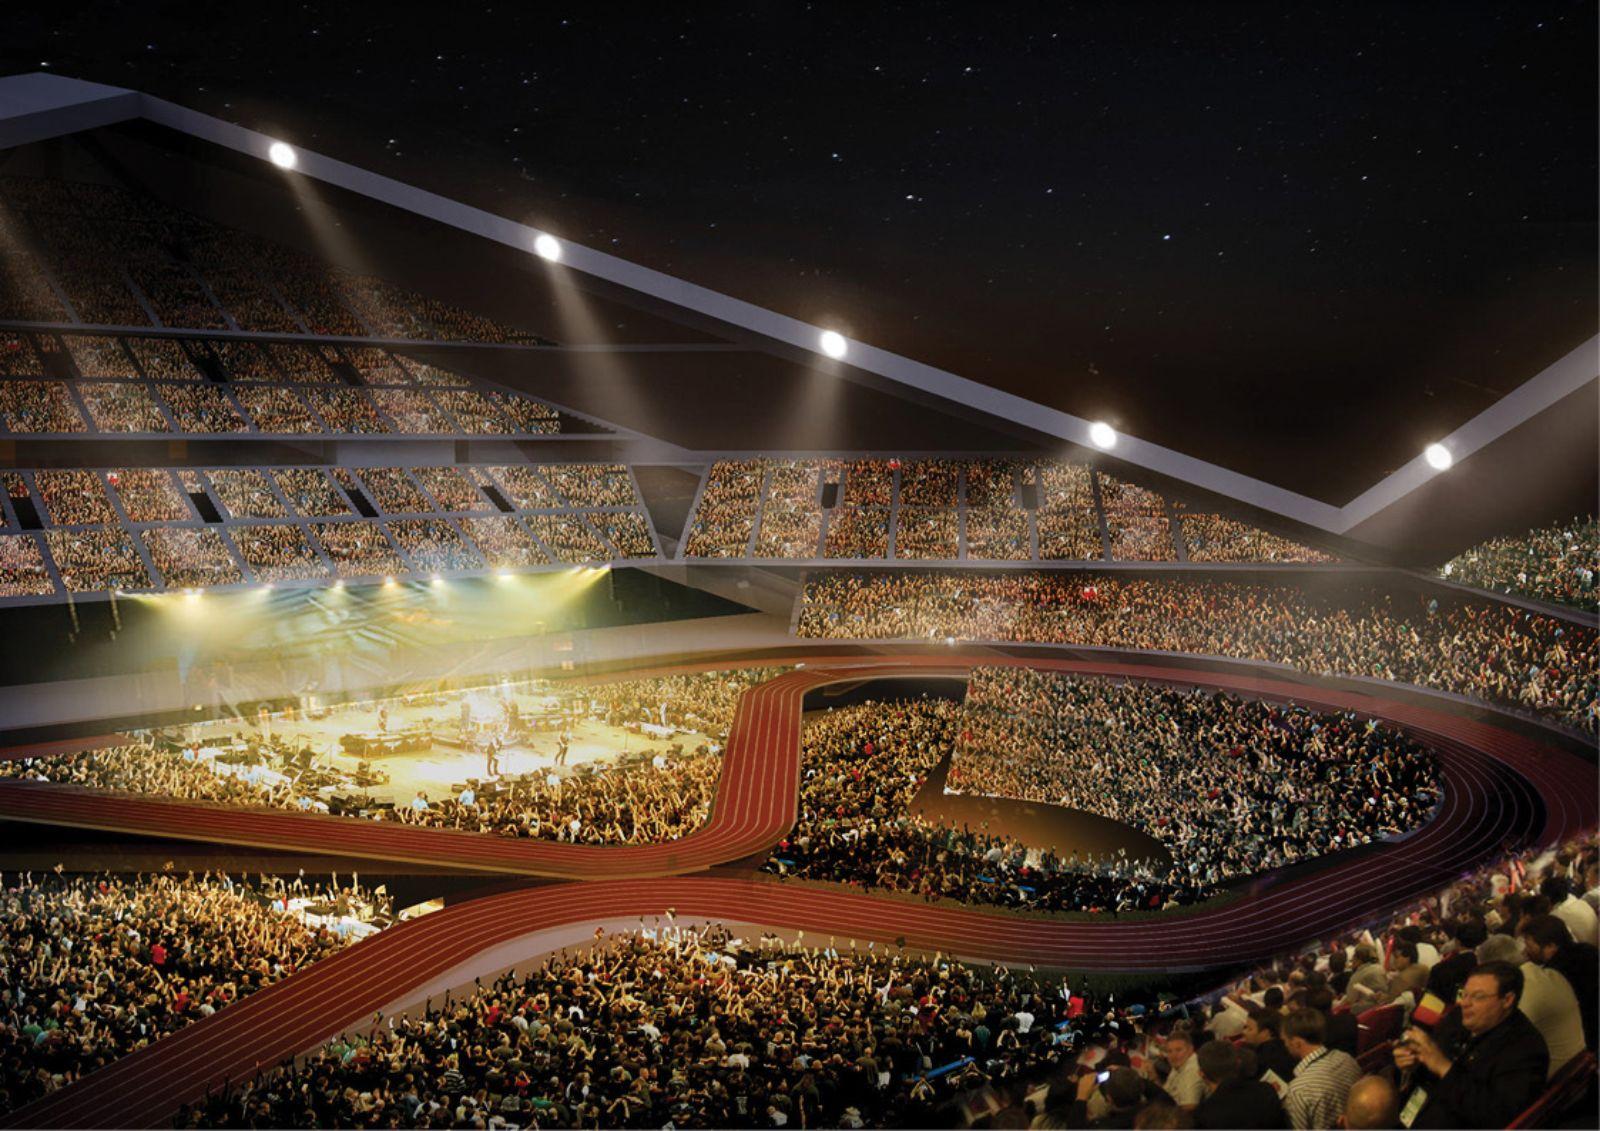 05-Brasilia-atletismo-Estadio-por-BF-arquitectura